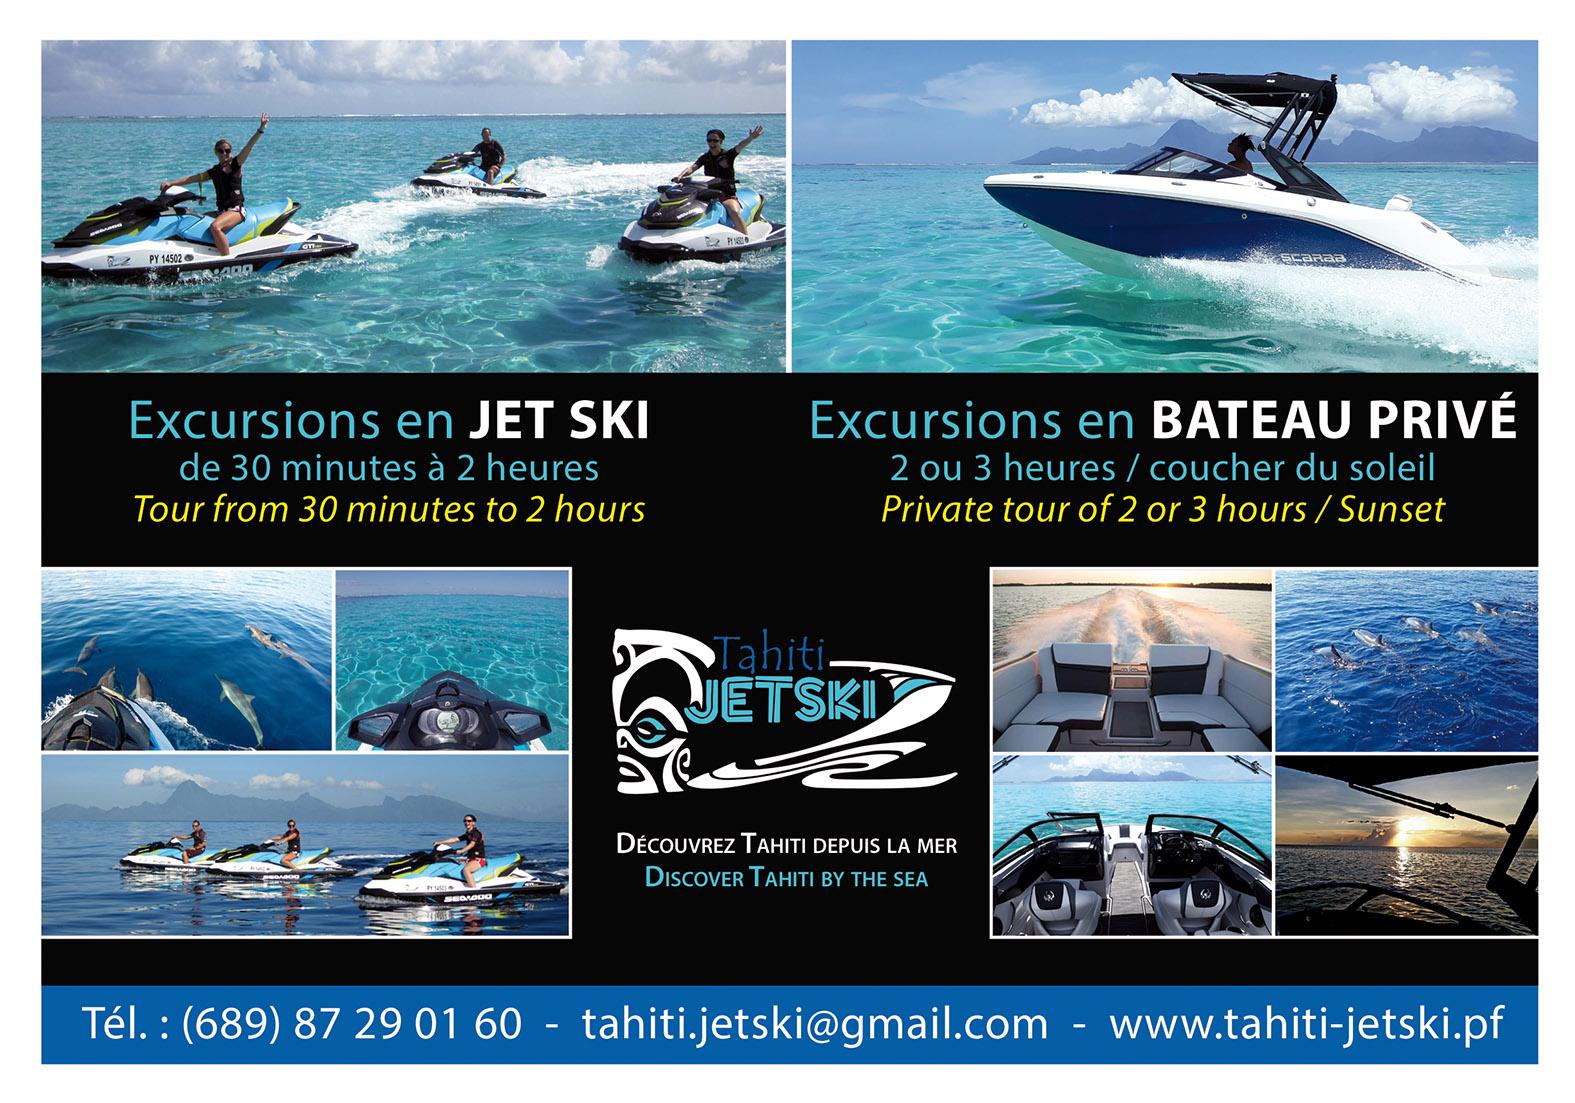 https://tahititourisme.ca/wp-content/uploads/2017/08/Tahiti-Jet-Ski-190x130-sept-2.jpg